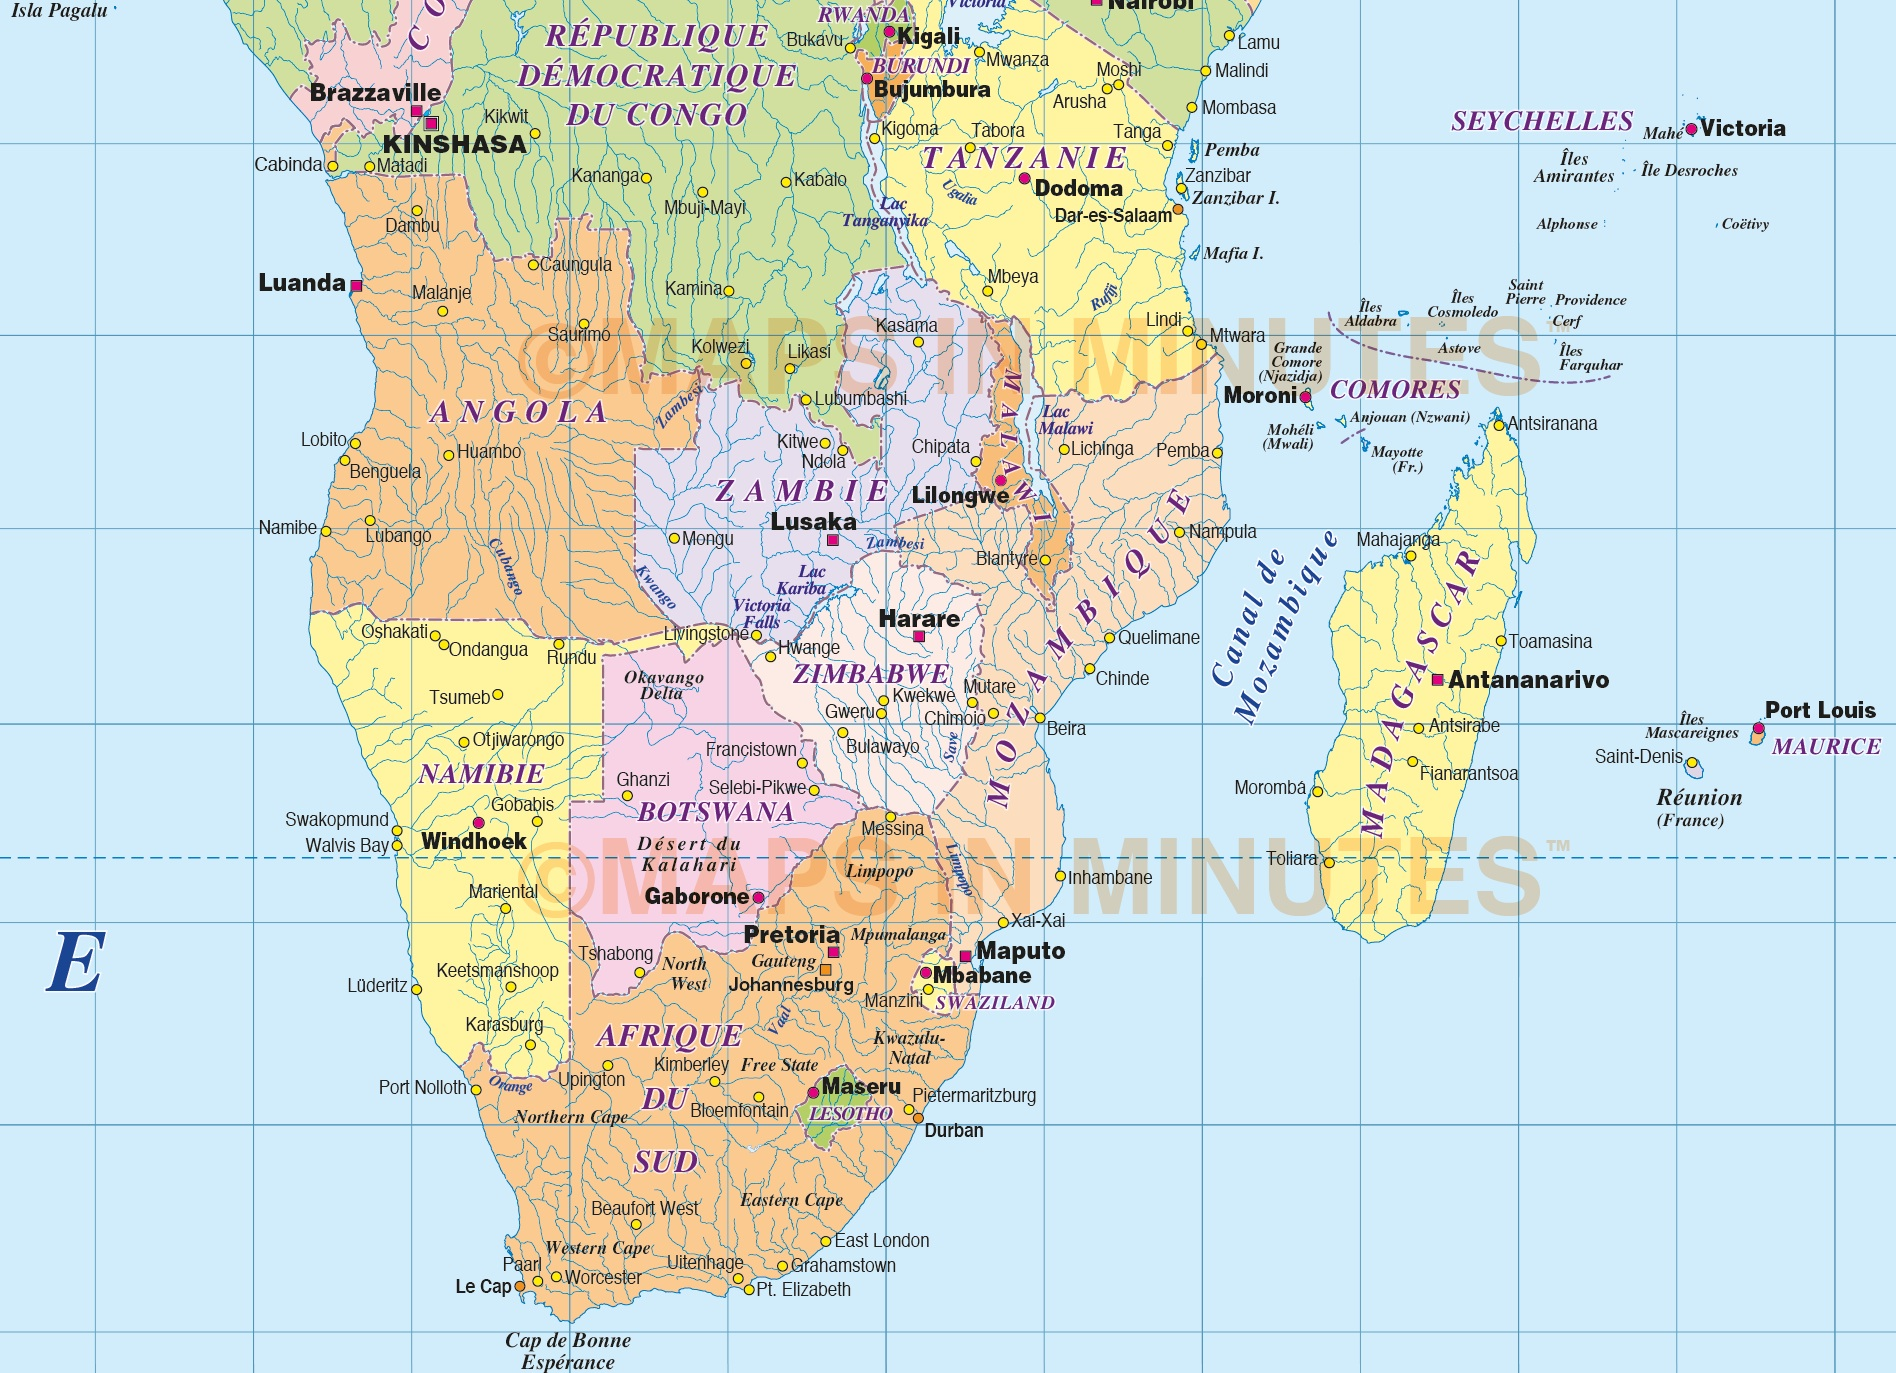 Digital vector world map carte franaise du monde politique vector world map in french carte politique du monde franaise gumiabroncs Images